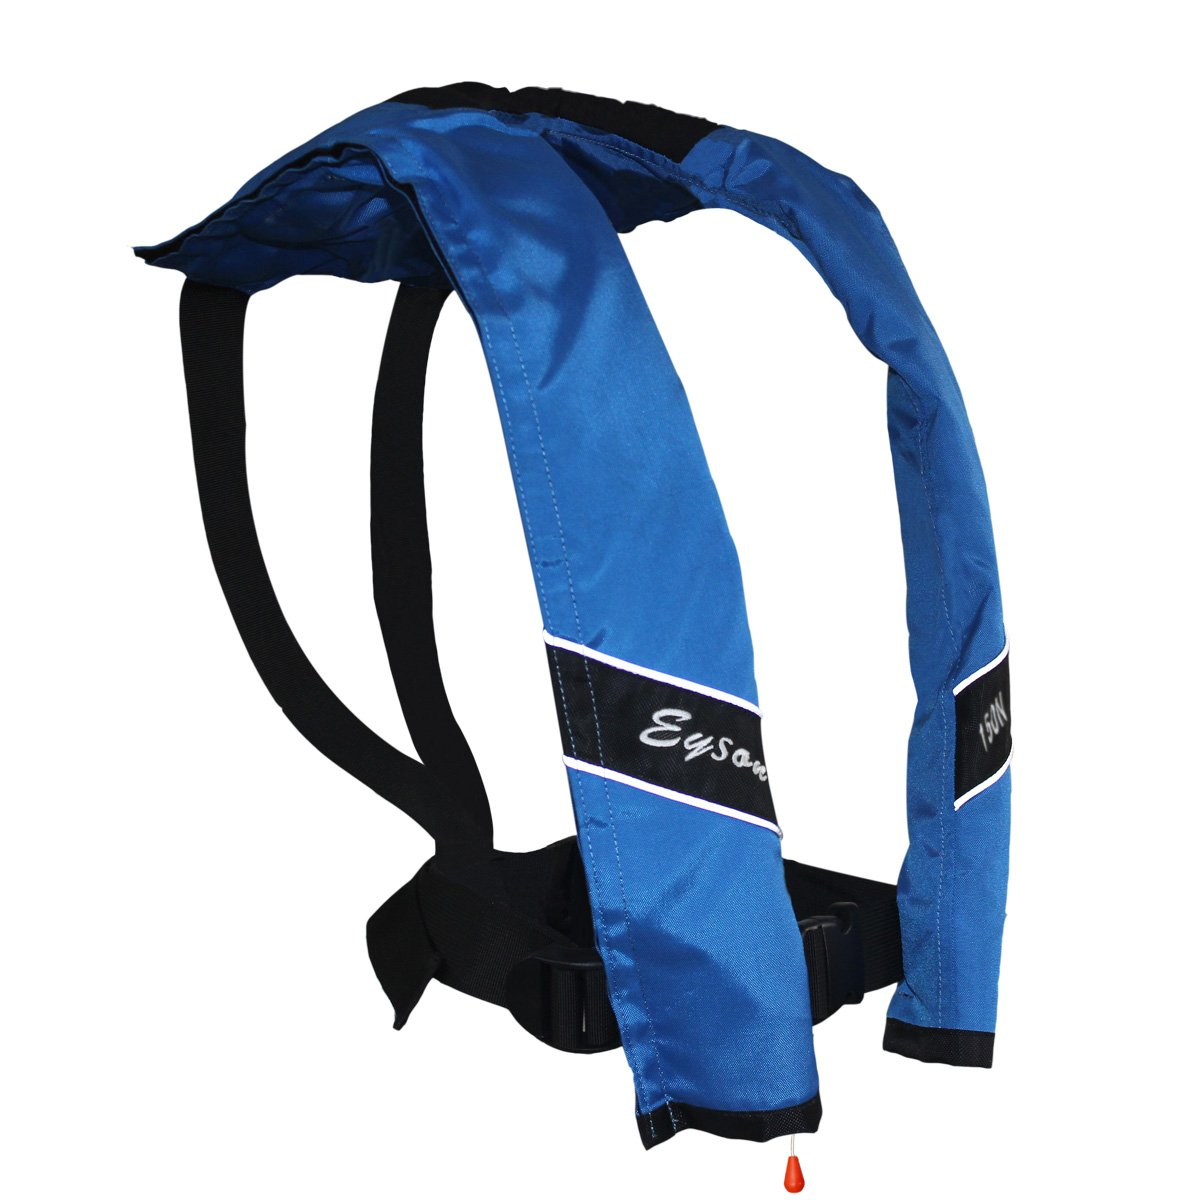 Eyson Slim Inflatable PFD Life Jacket Life Vest Adult Automatic (Blue)